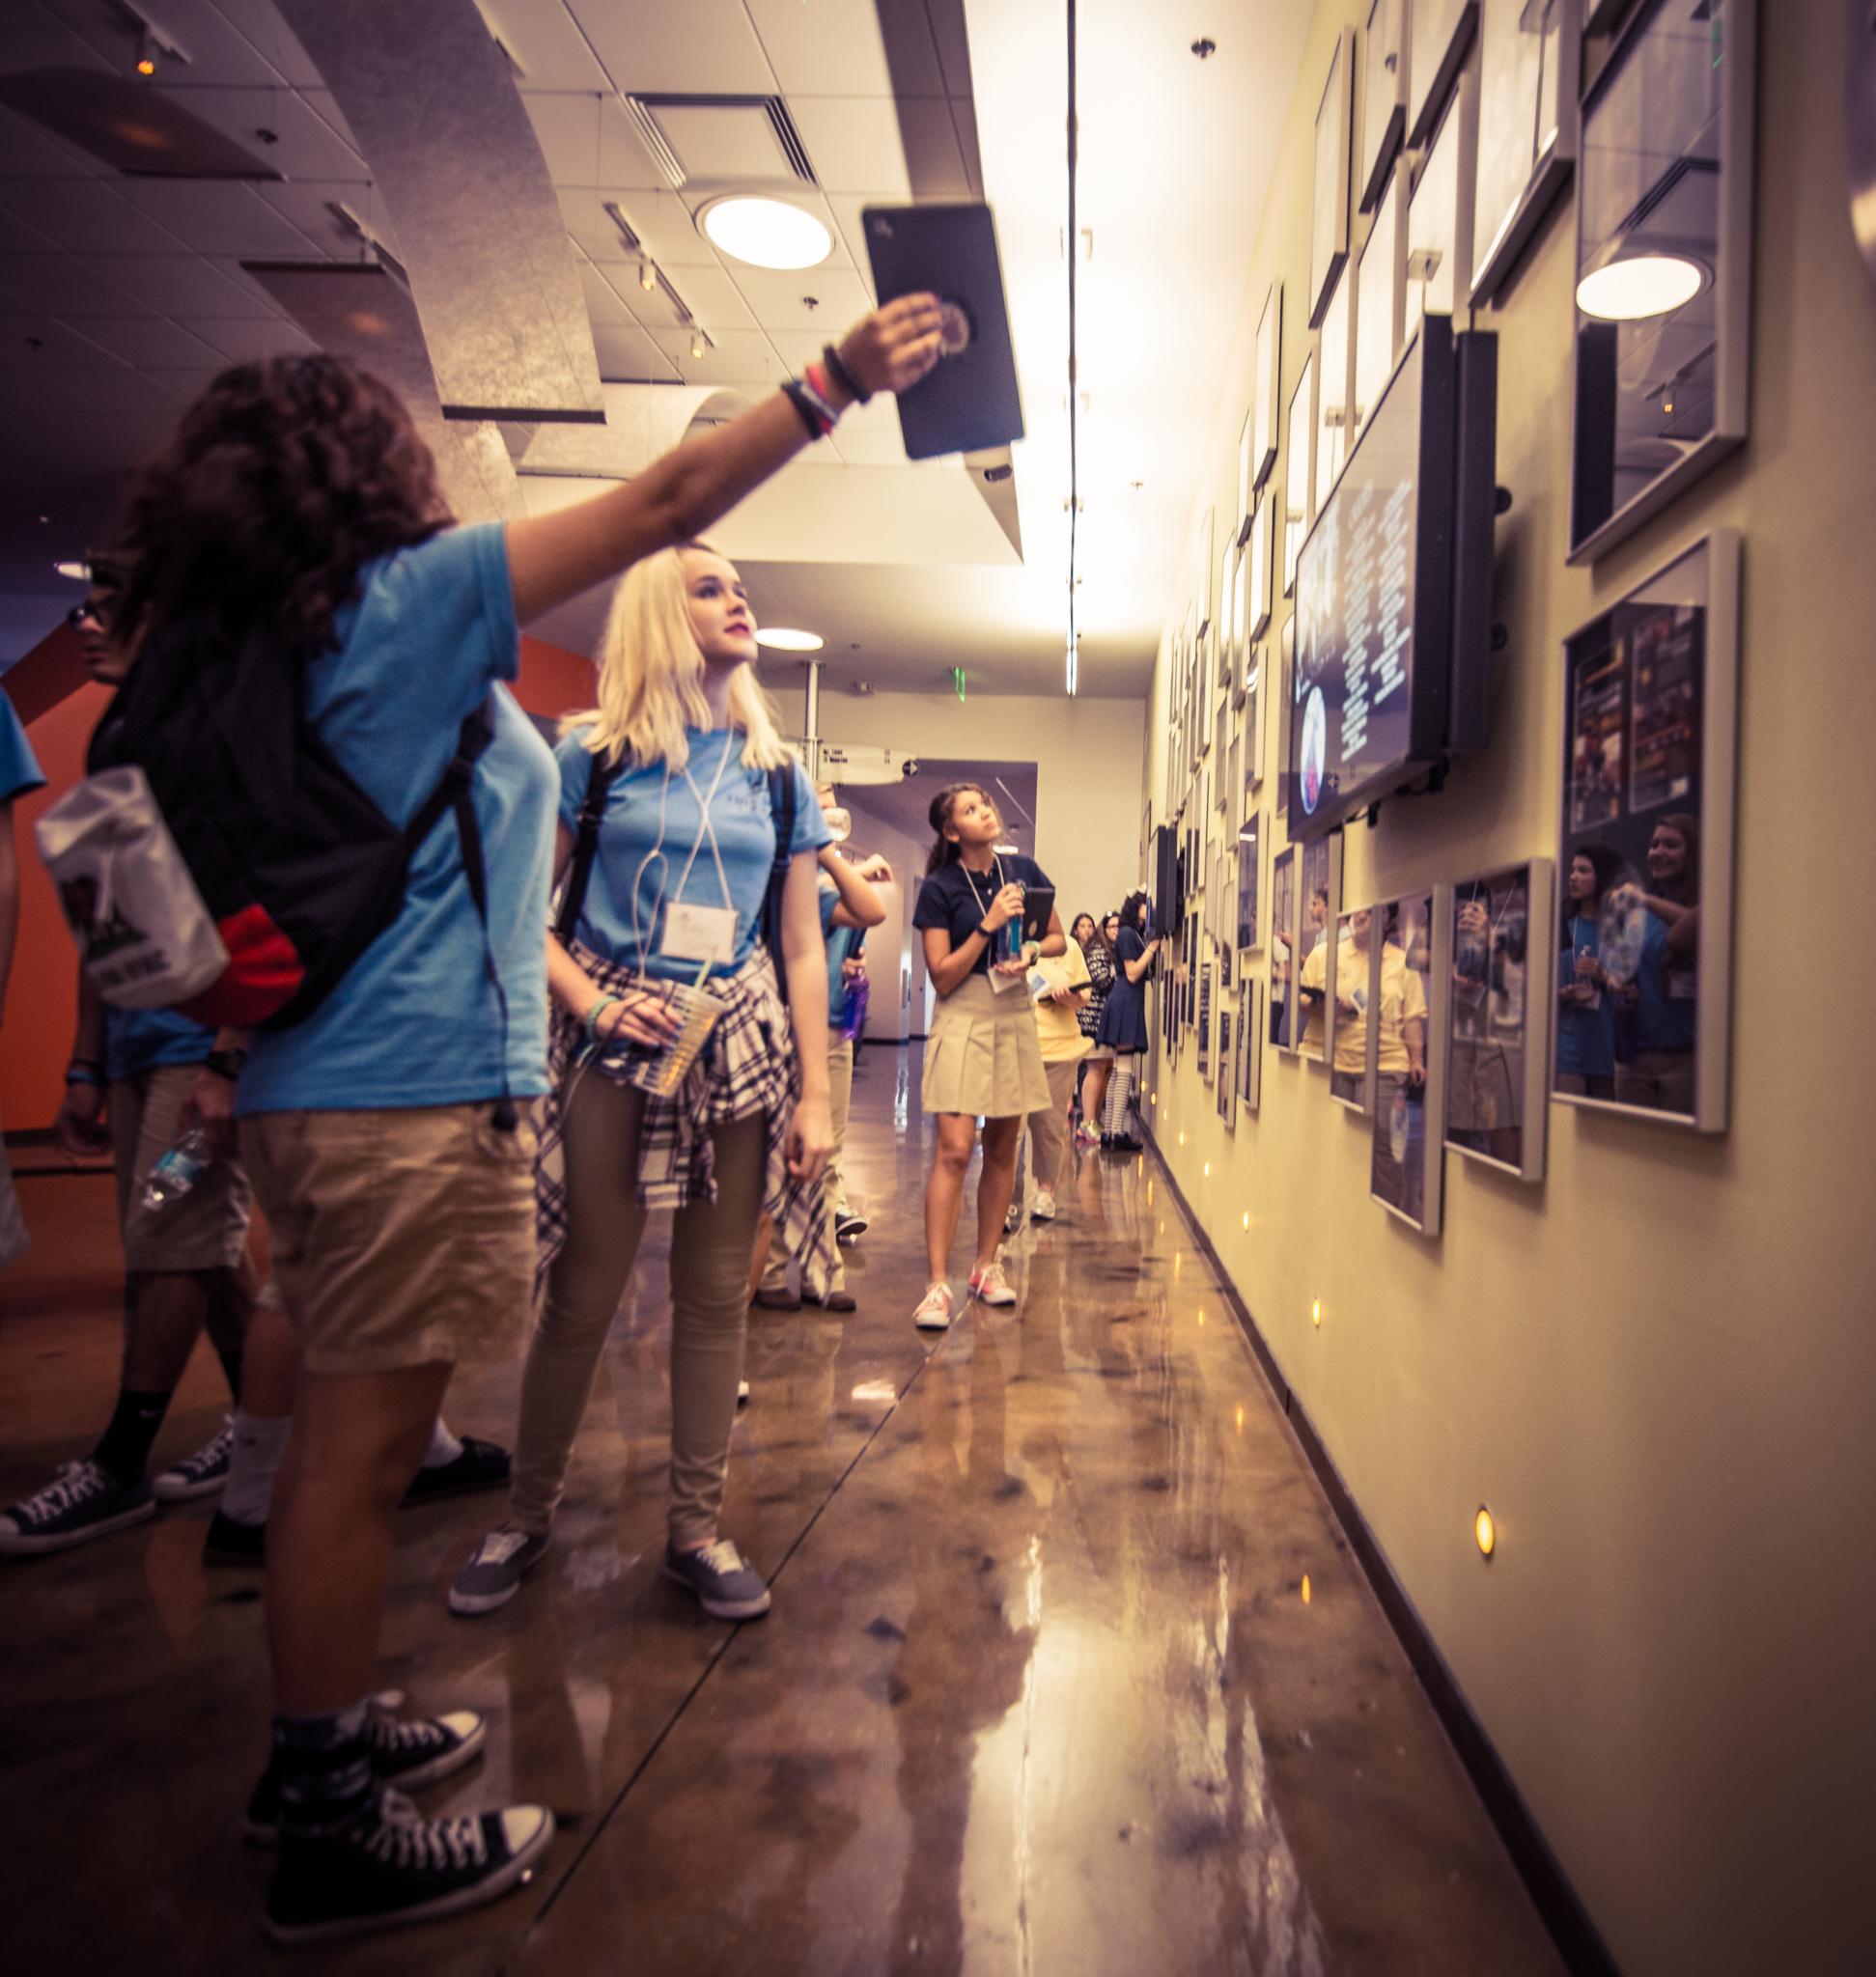 FS_LABS_One_School_of_the_Arts_Aug.25_03.jpg